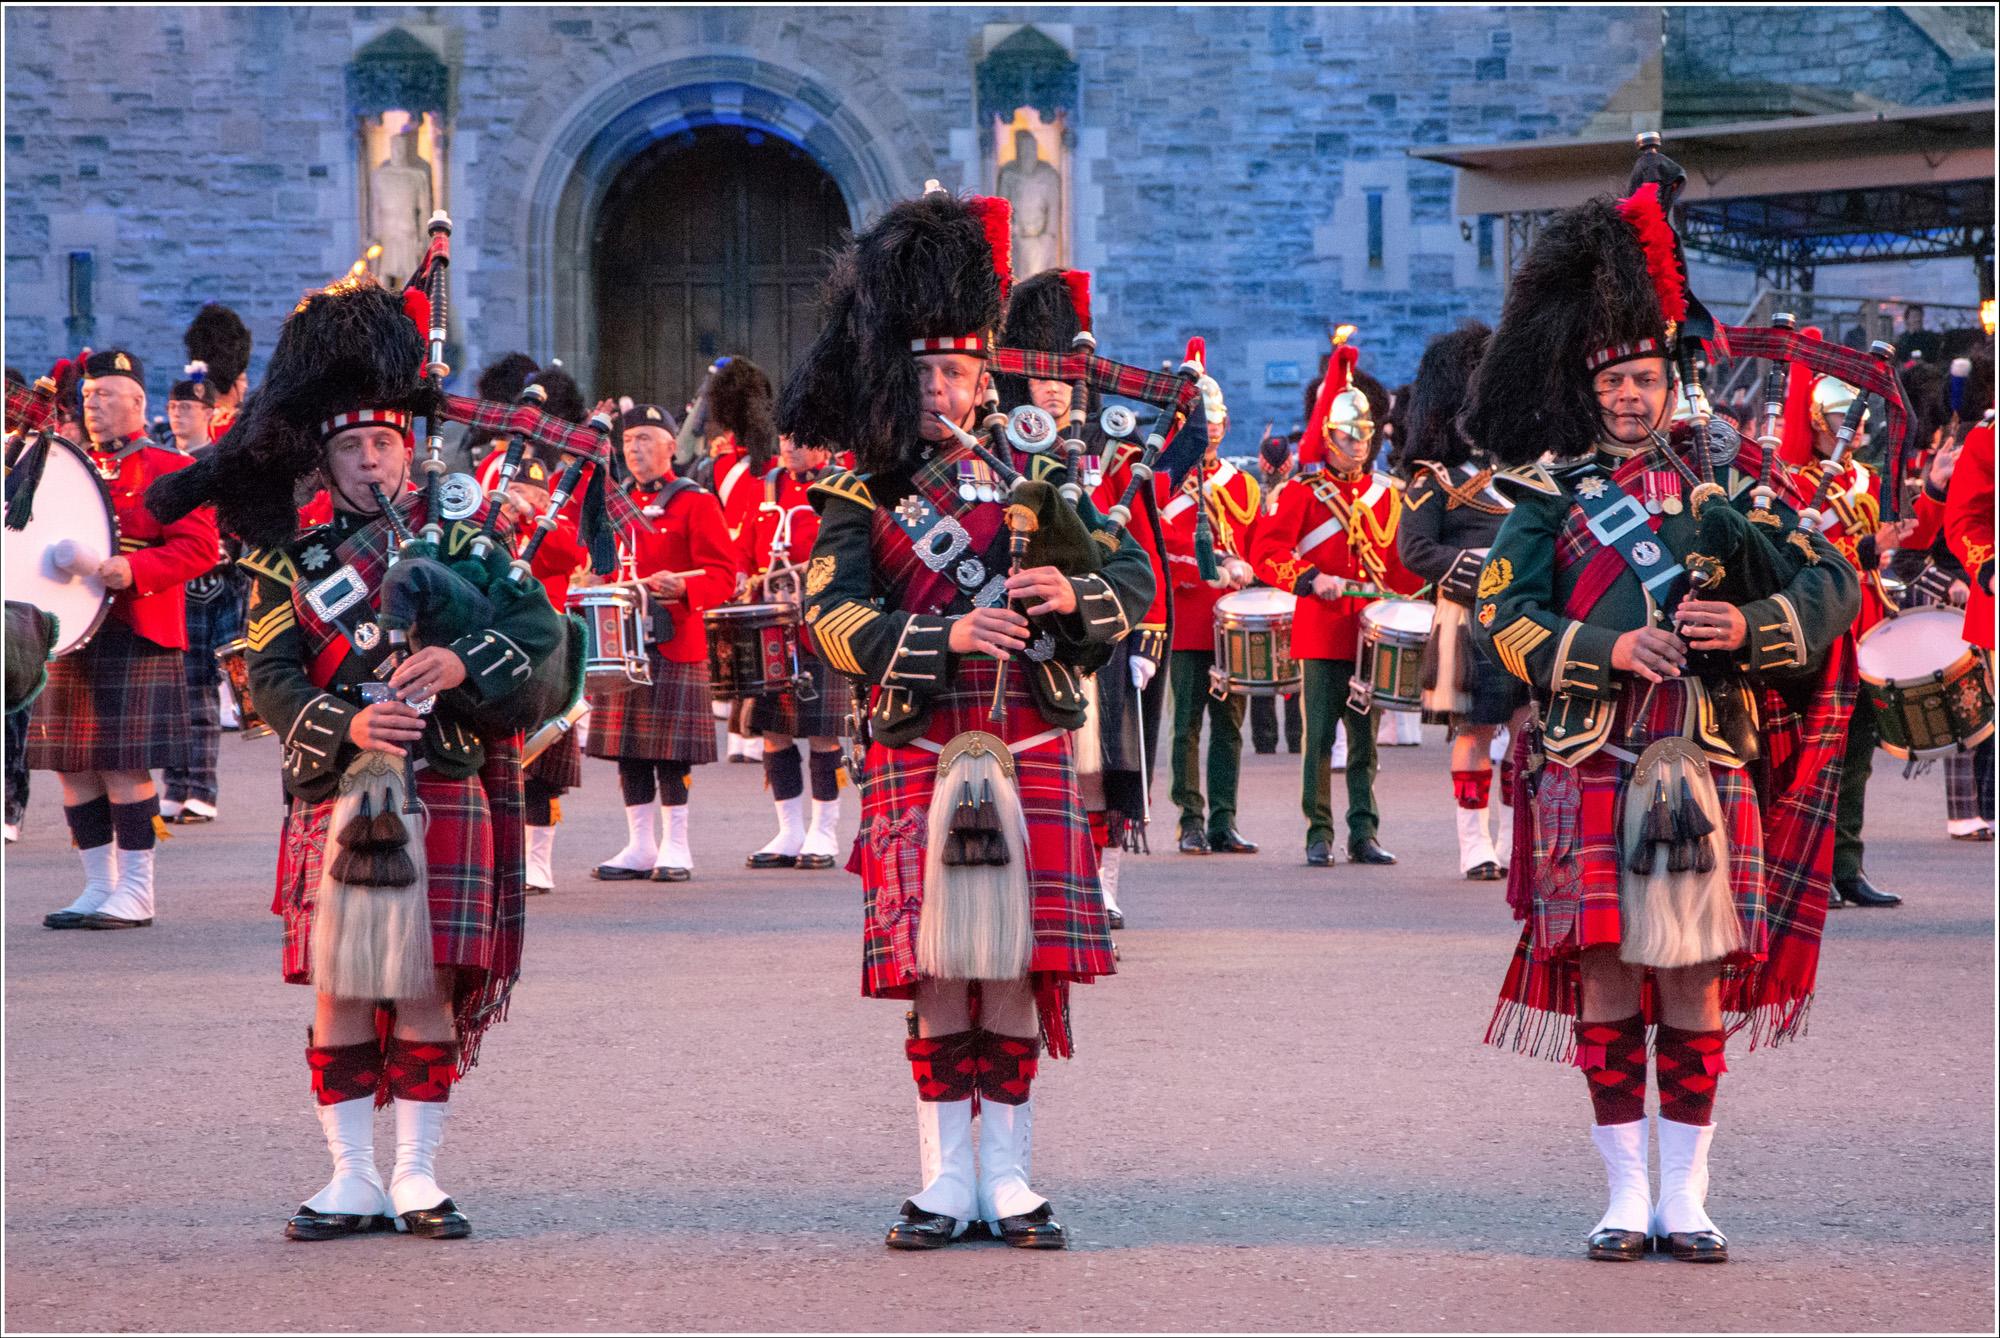 The Black Watch (Royal Highland Regiment) of Canada